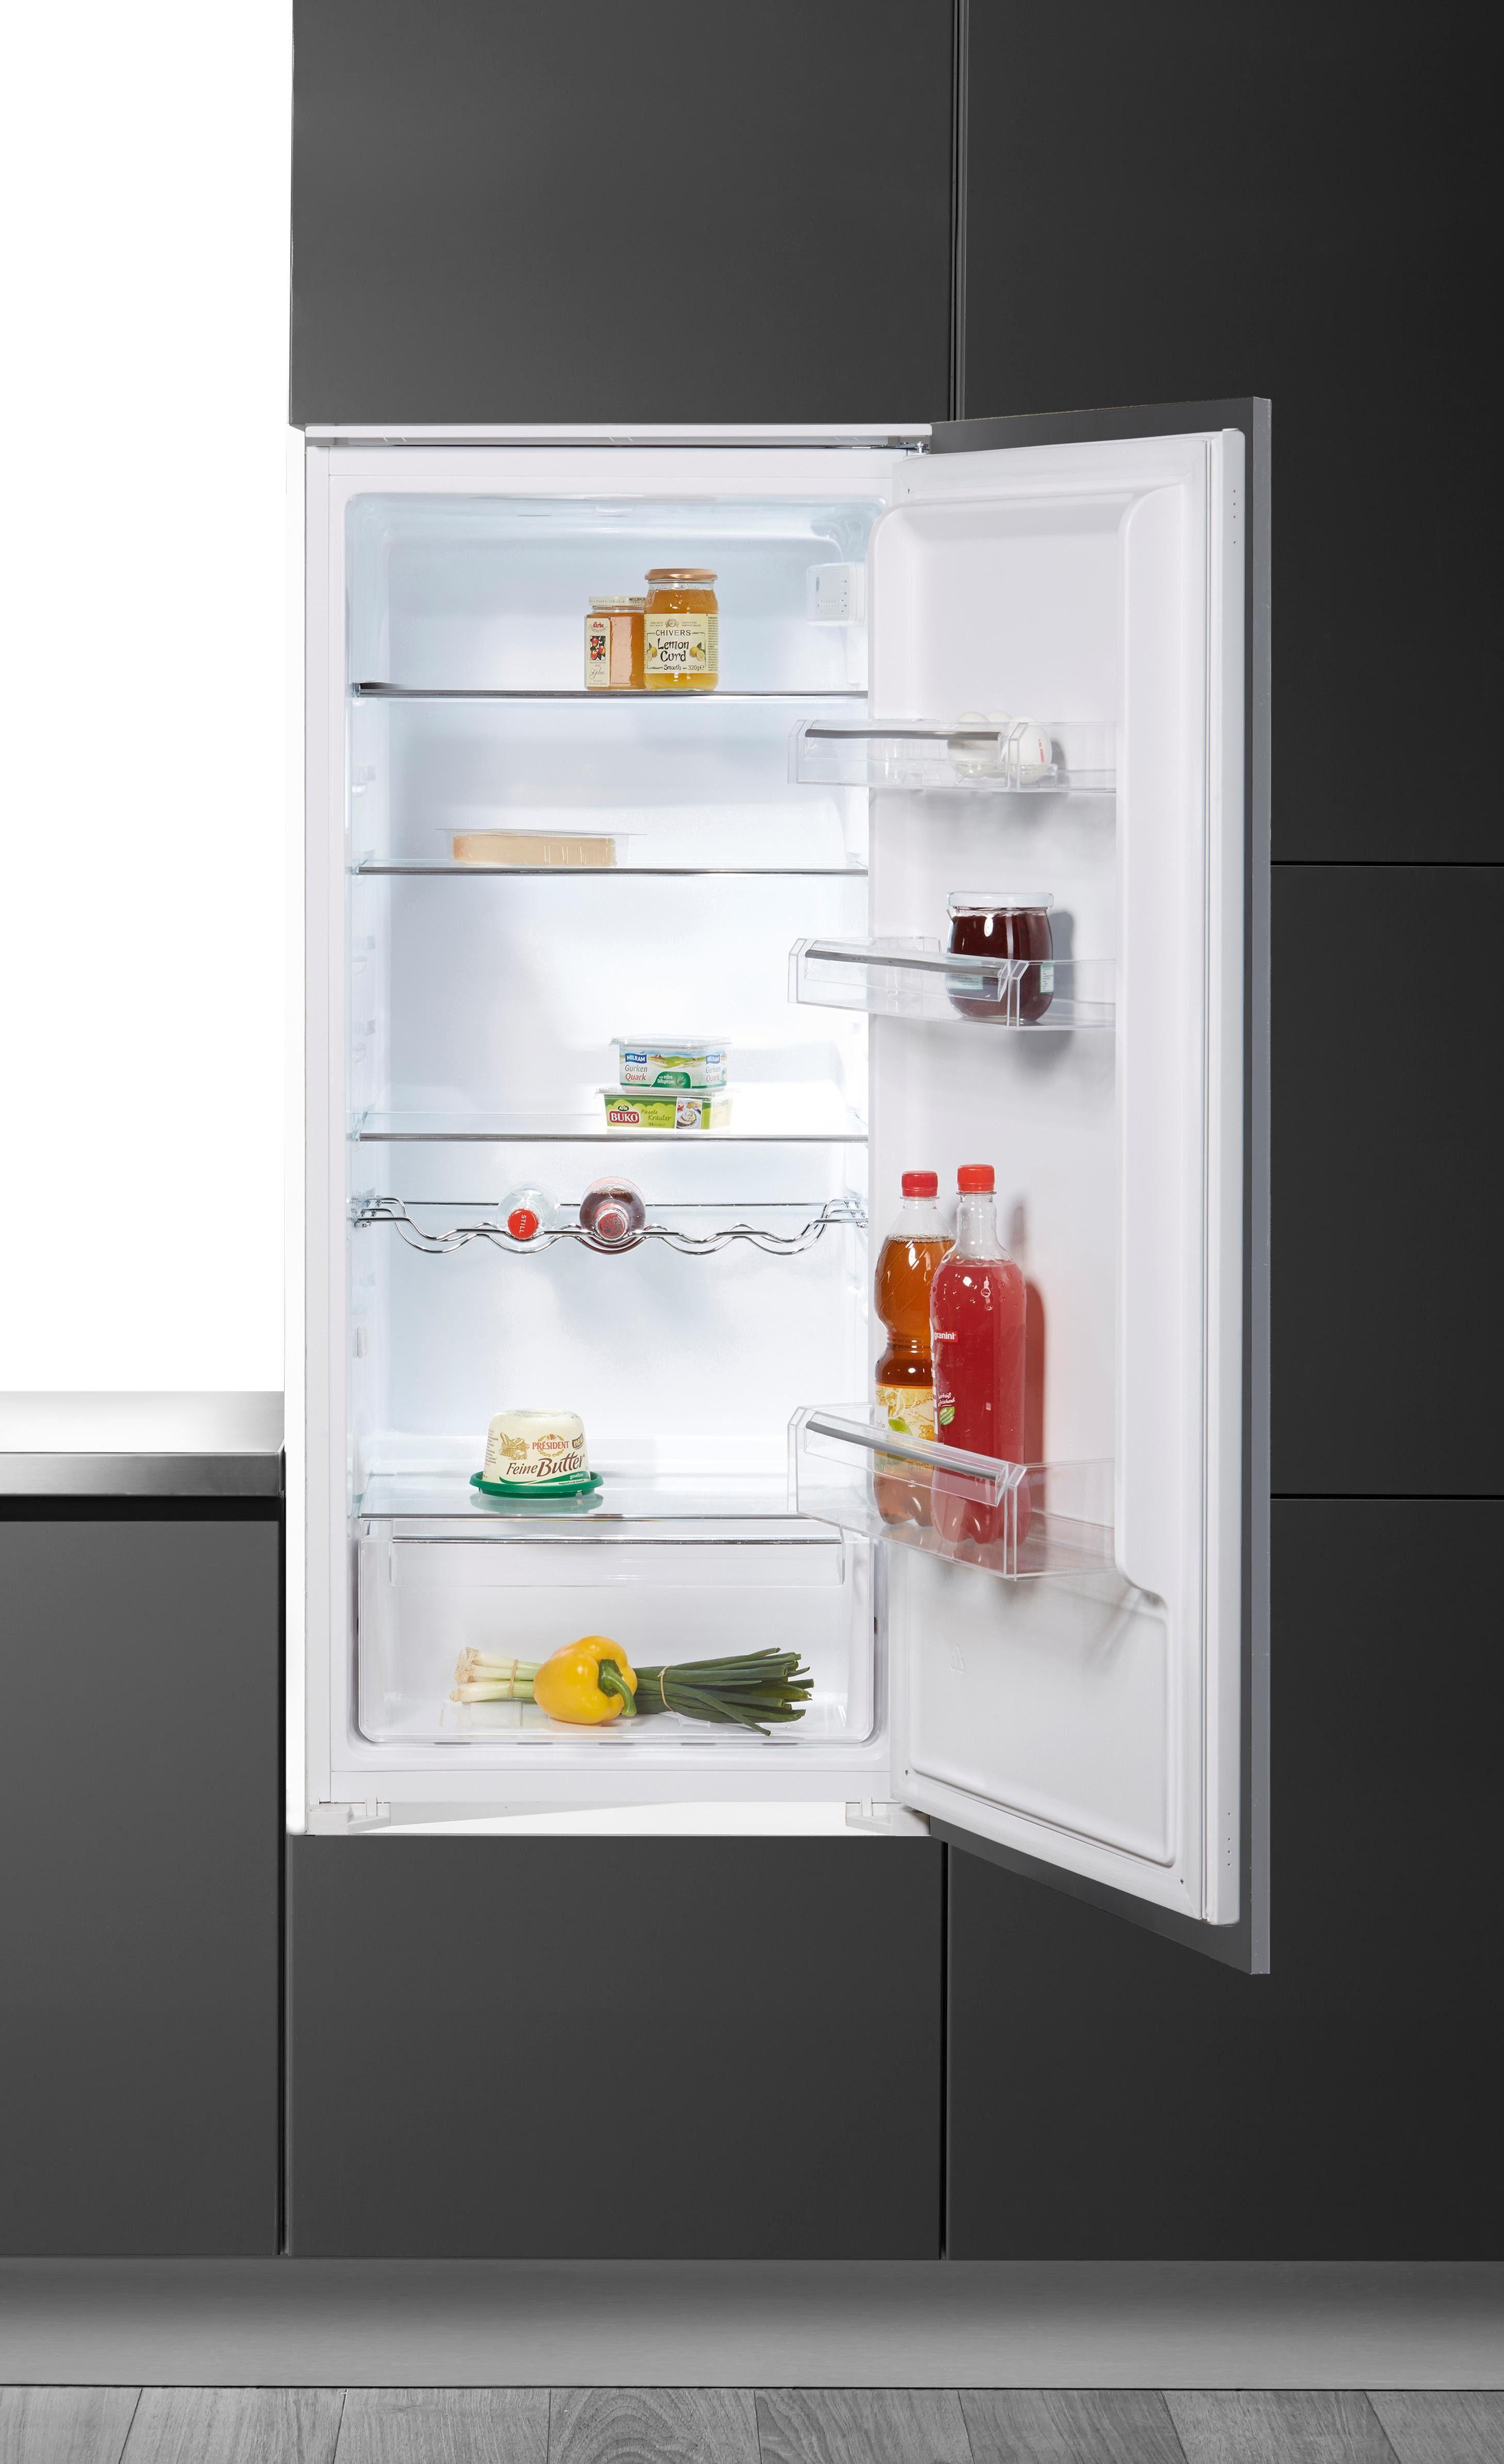 Hanseatic Einbau-Kühlschrank HEKS12254A2, Energieklasse A++